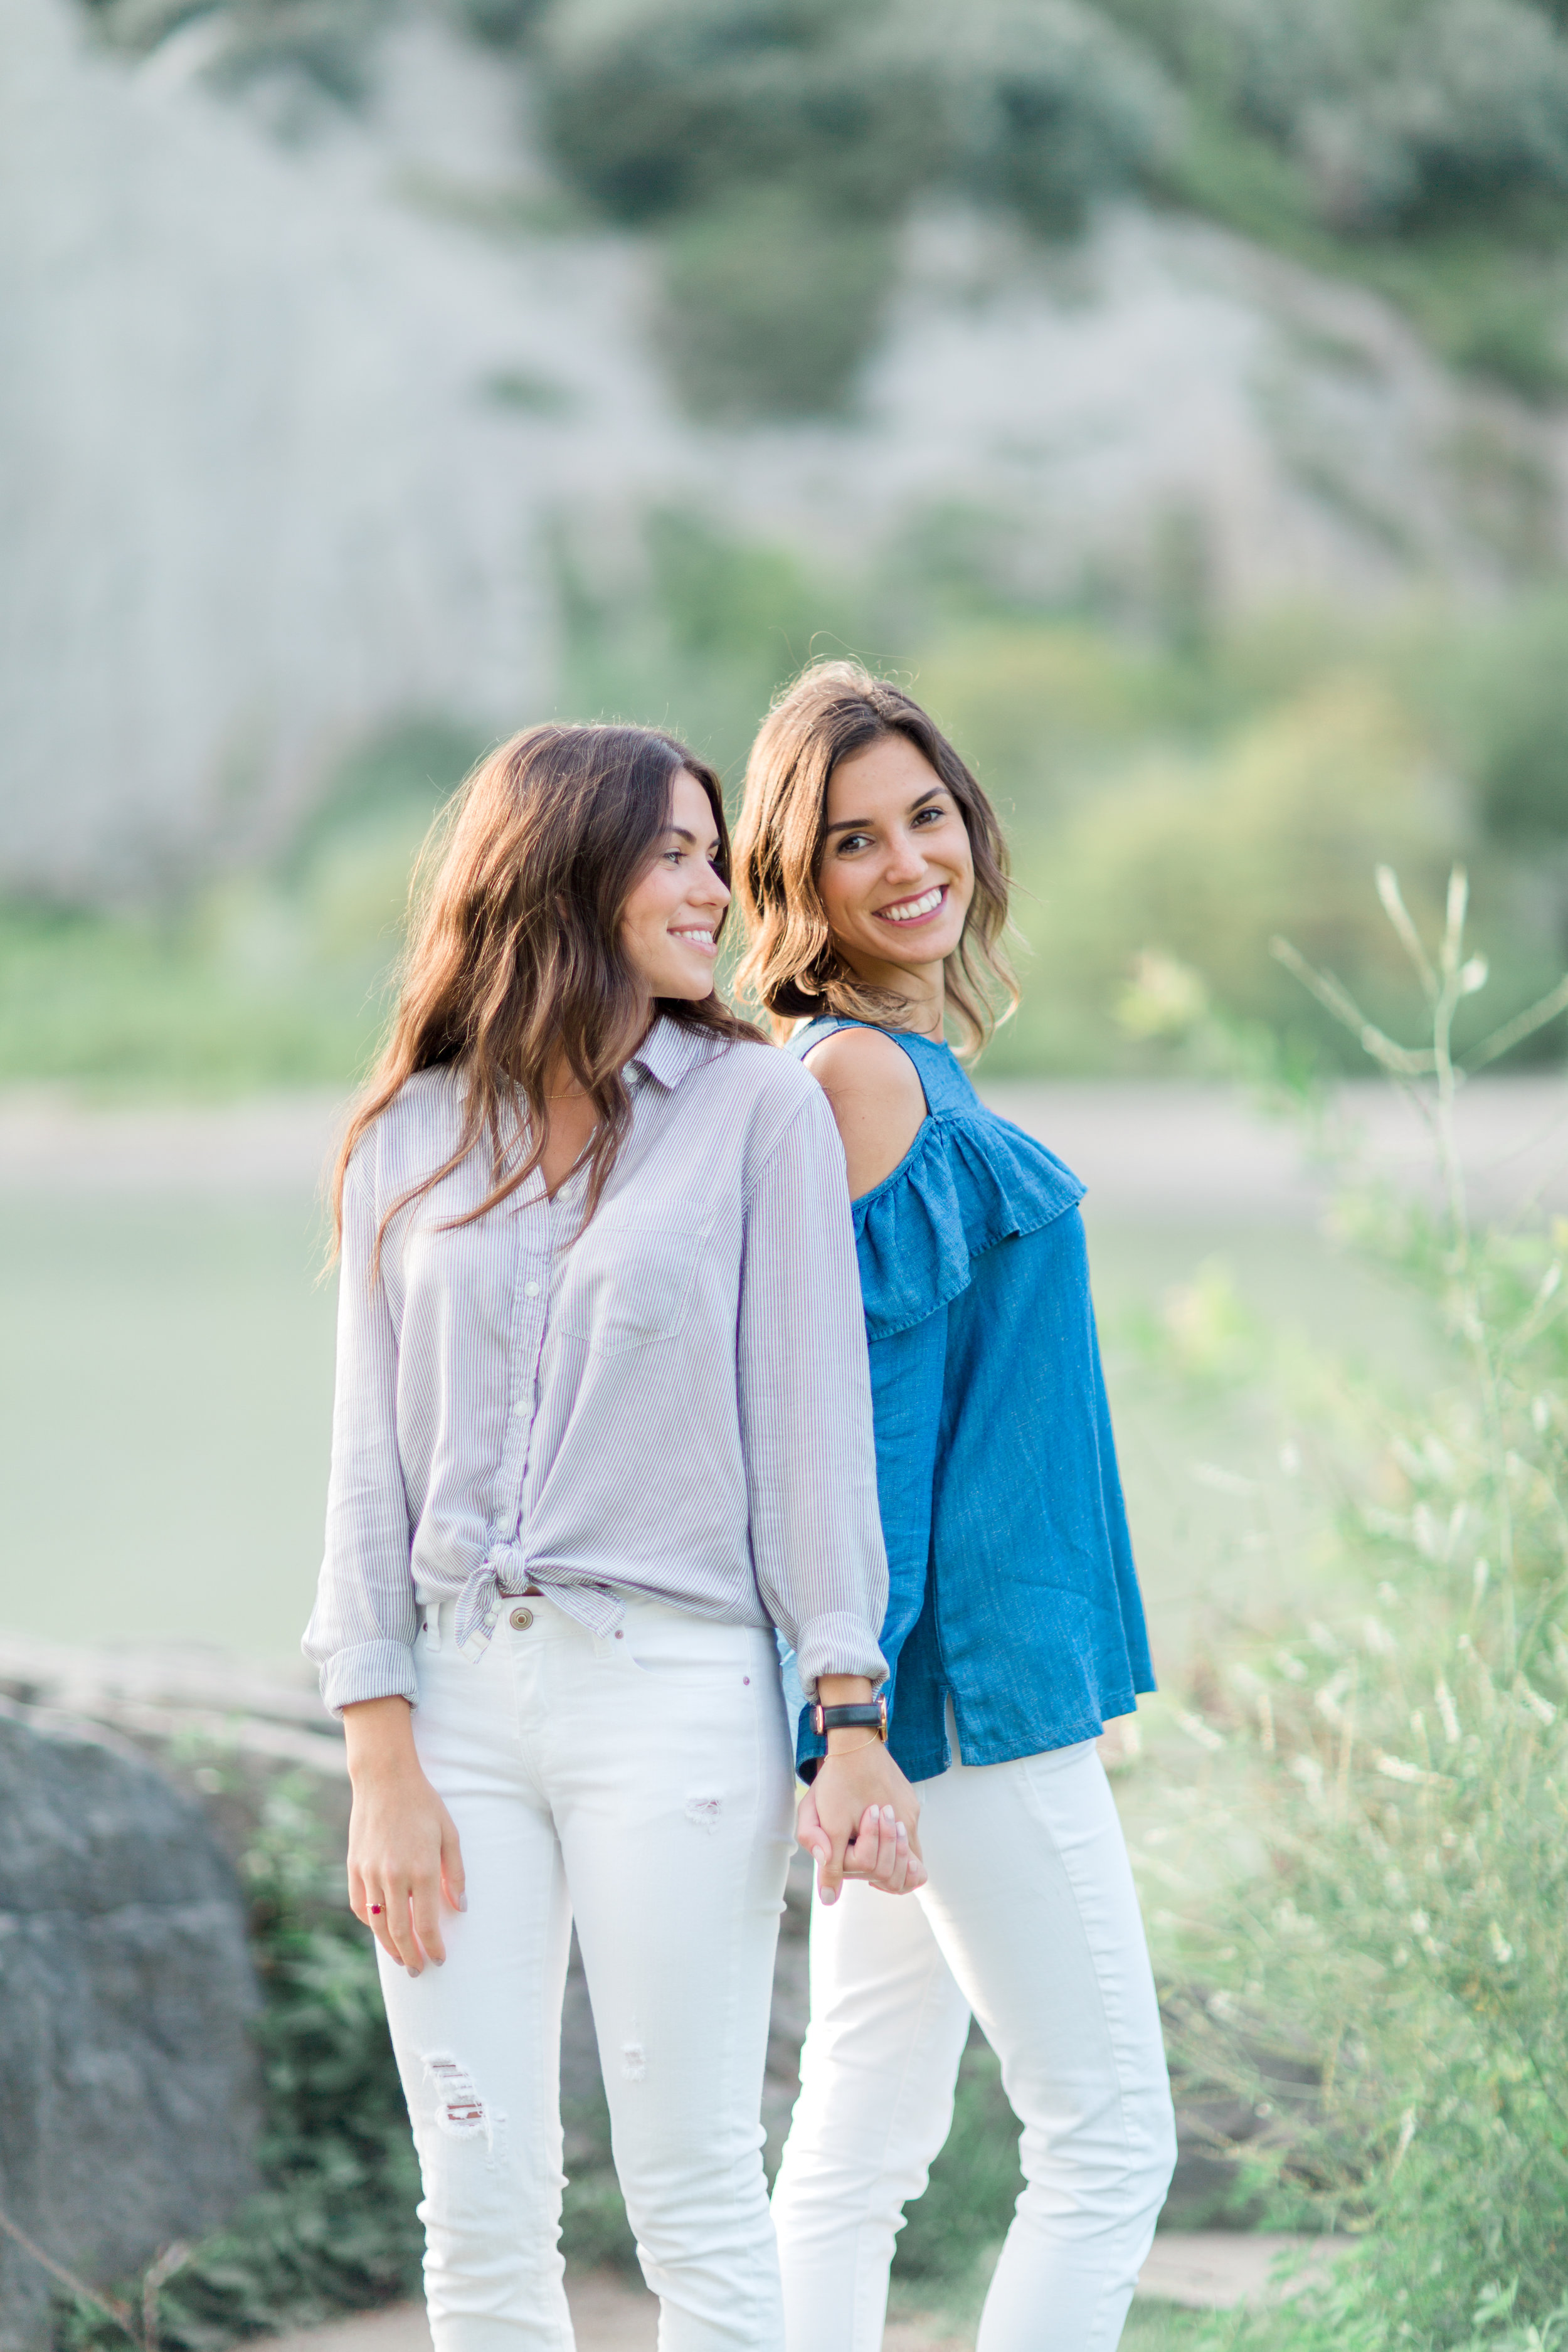 Danielle-Giroux-Amir-Golbazi-Genua-Family-Photography-Scarborough-Bluffs-0025.jpg